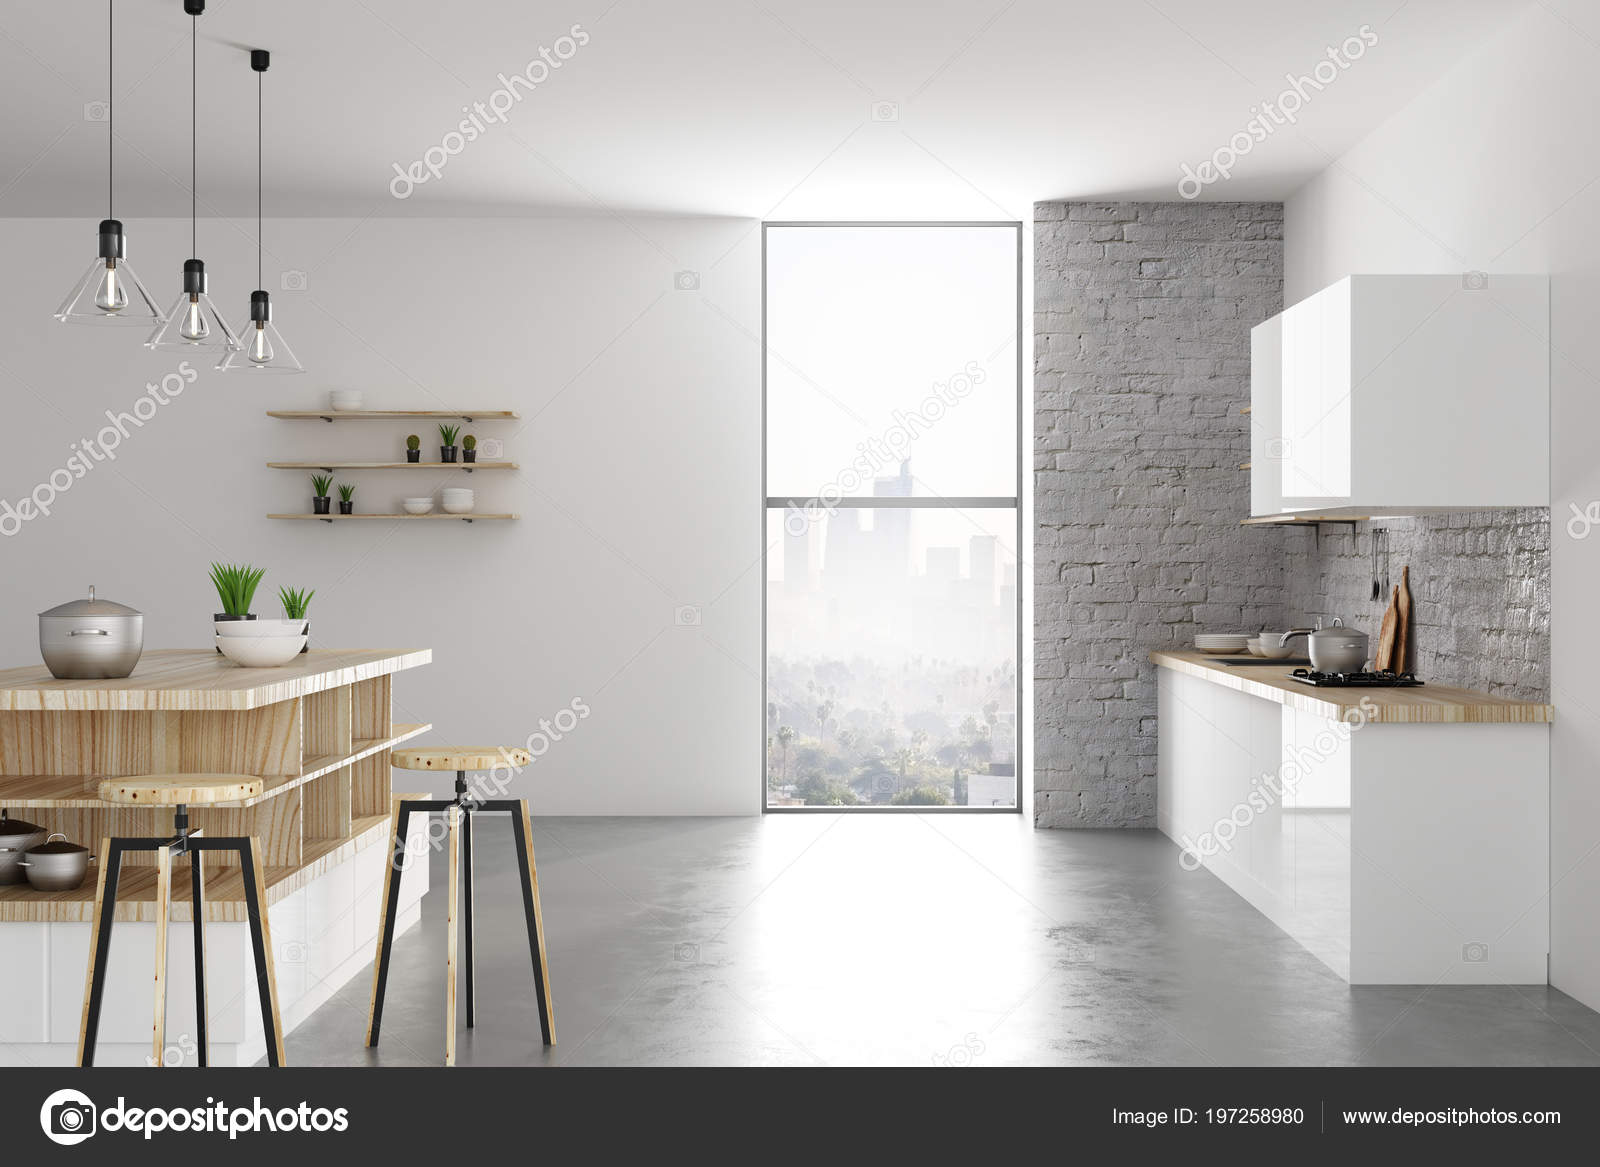 Daglicht Je Keuken : Hedendaagse lichte loft keuken interieur met meubels apparaten